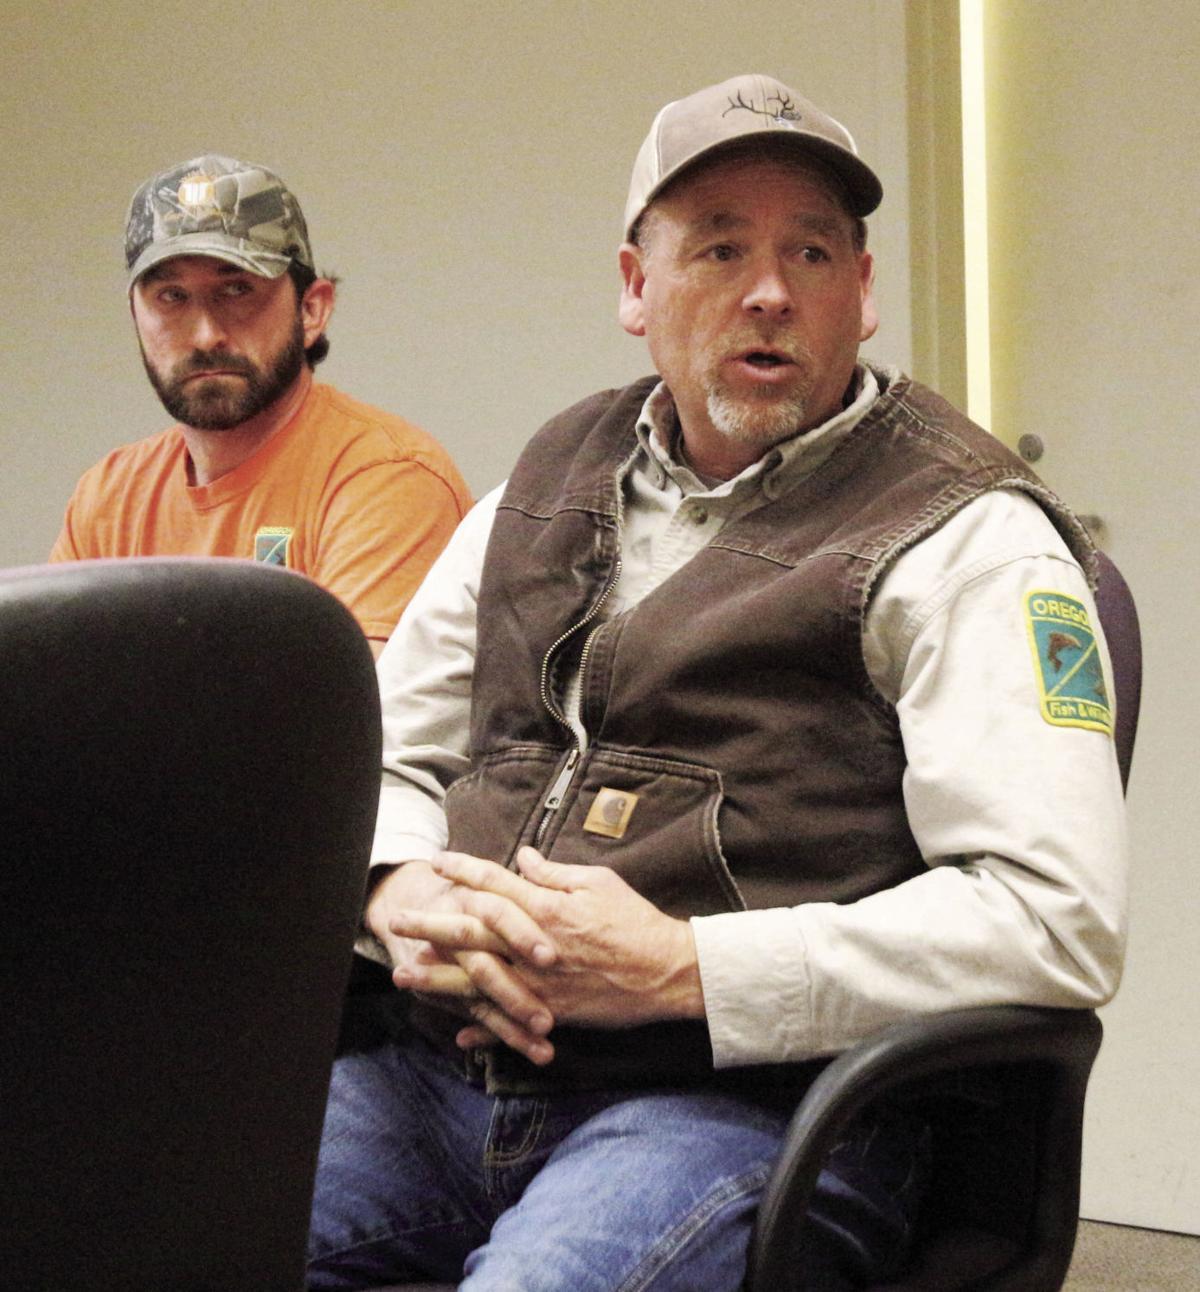 Wolf kills down in Klamath County in 2019